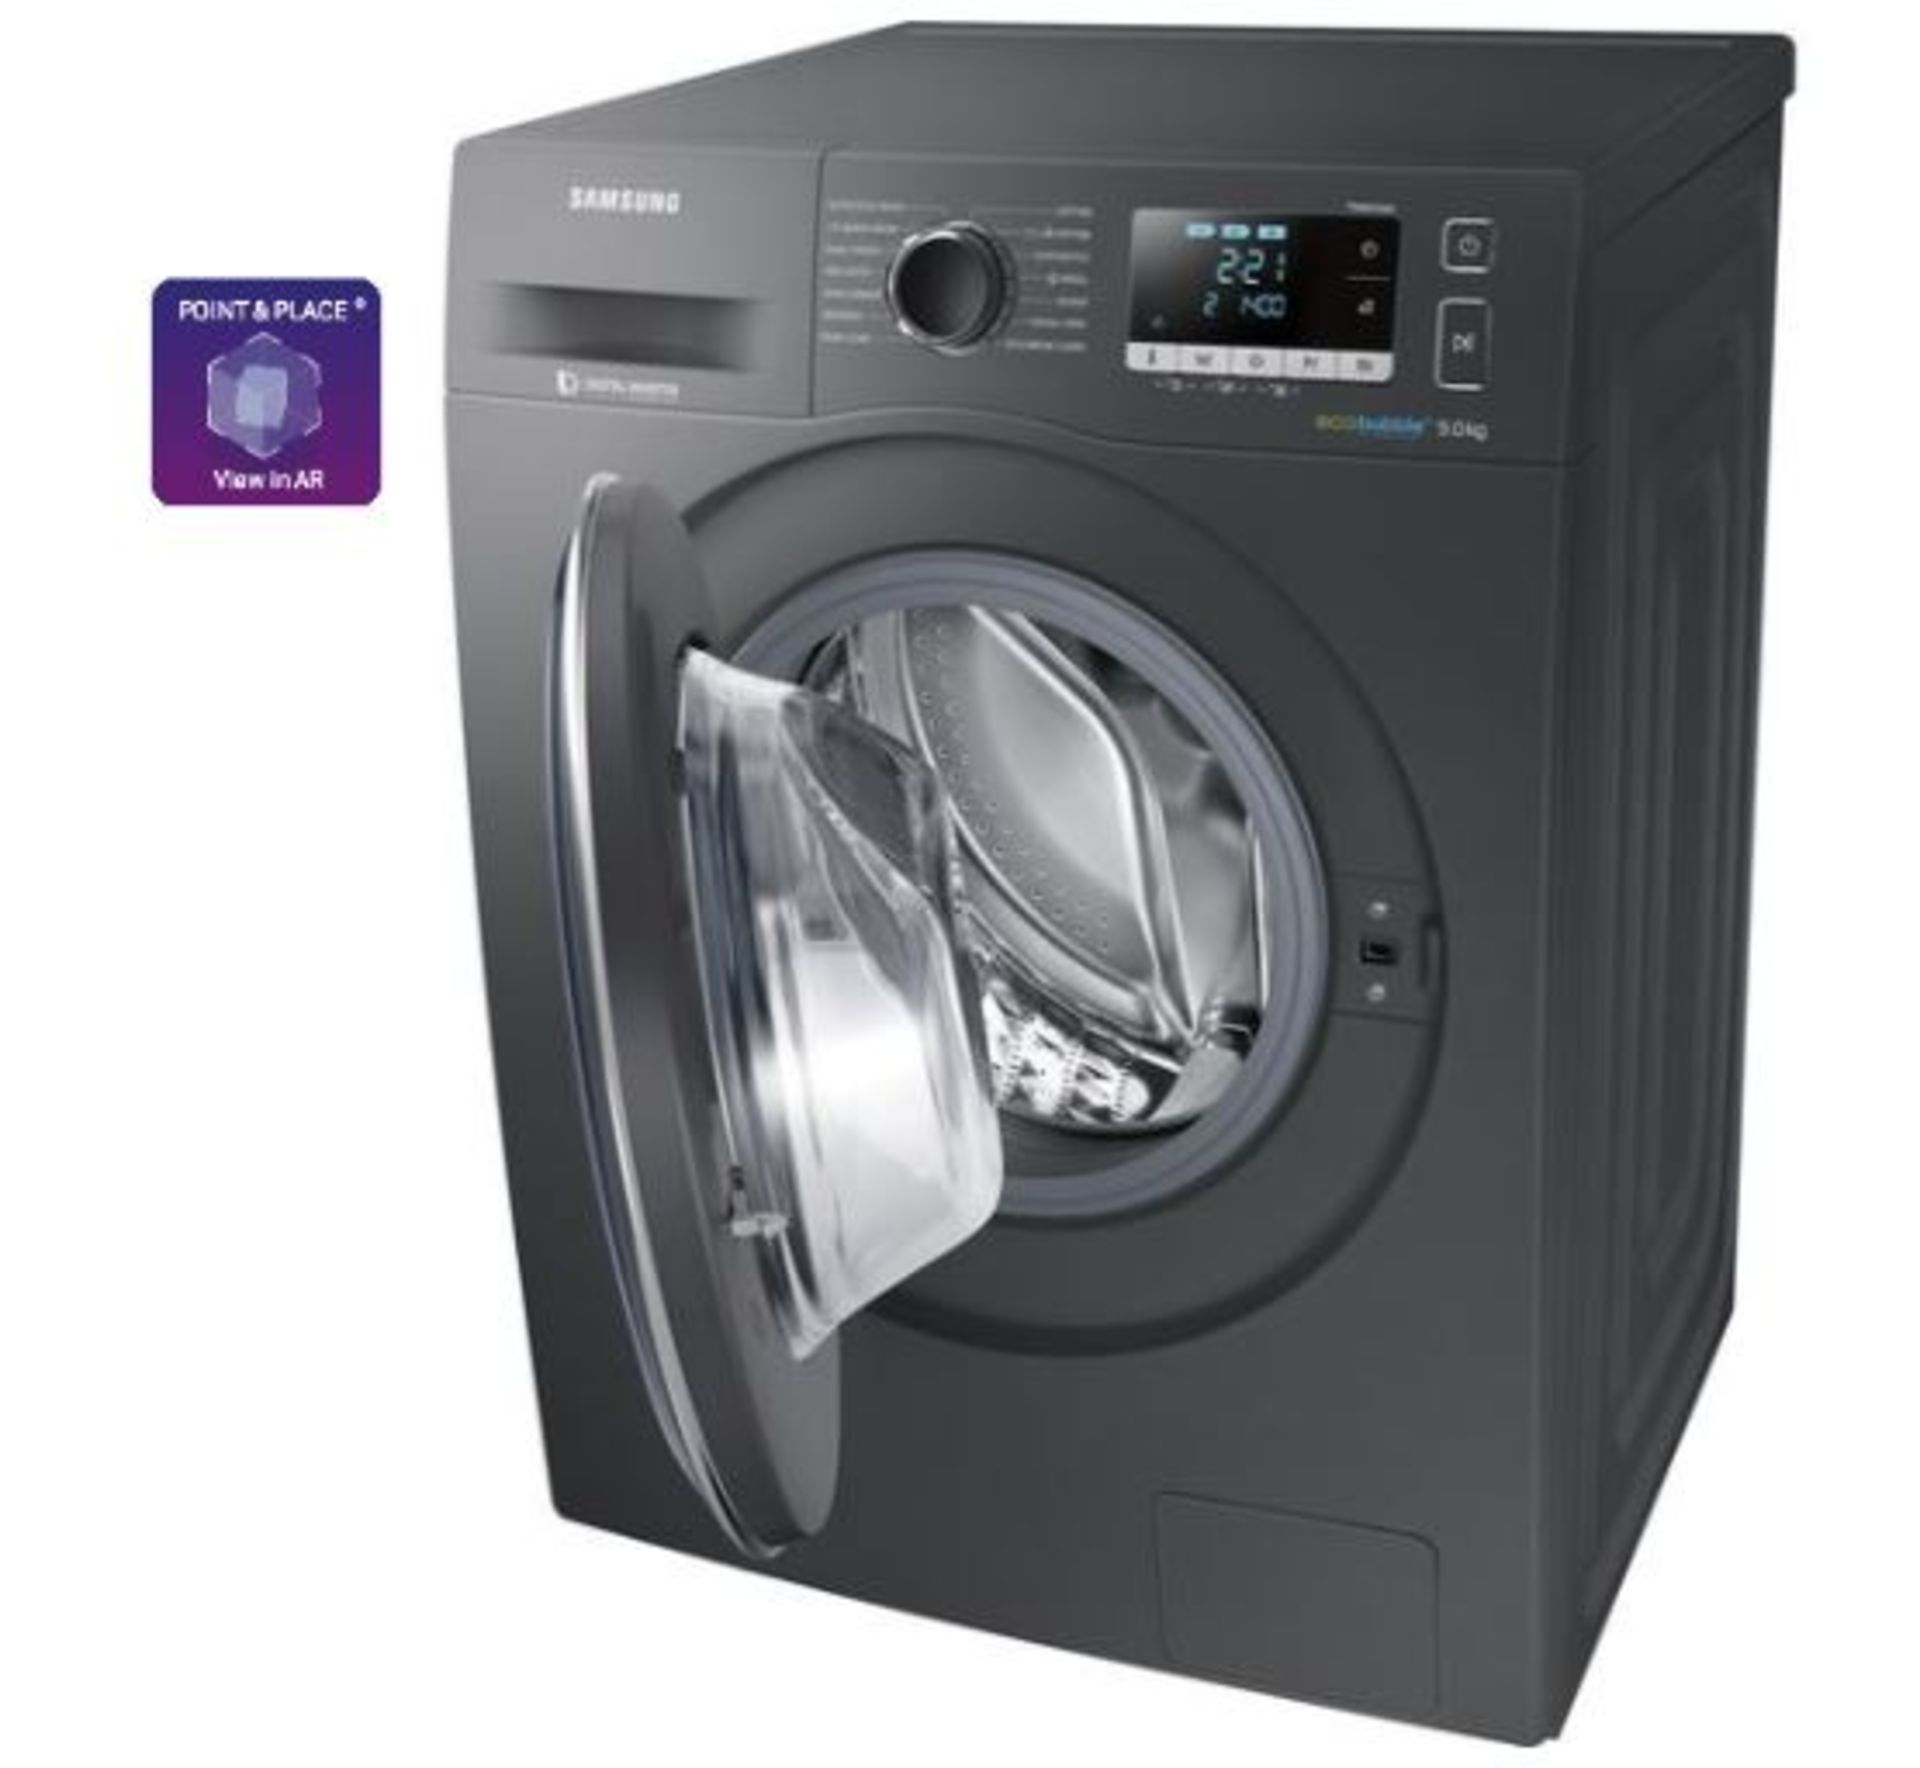 Pallet of 2 Samsung Premium Washing machines. Latest selling price £738 - Image 2 of 8